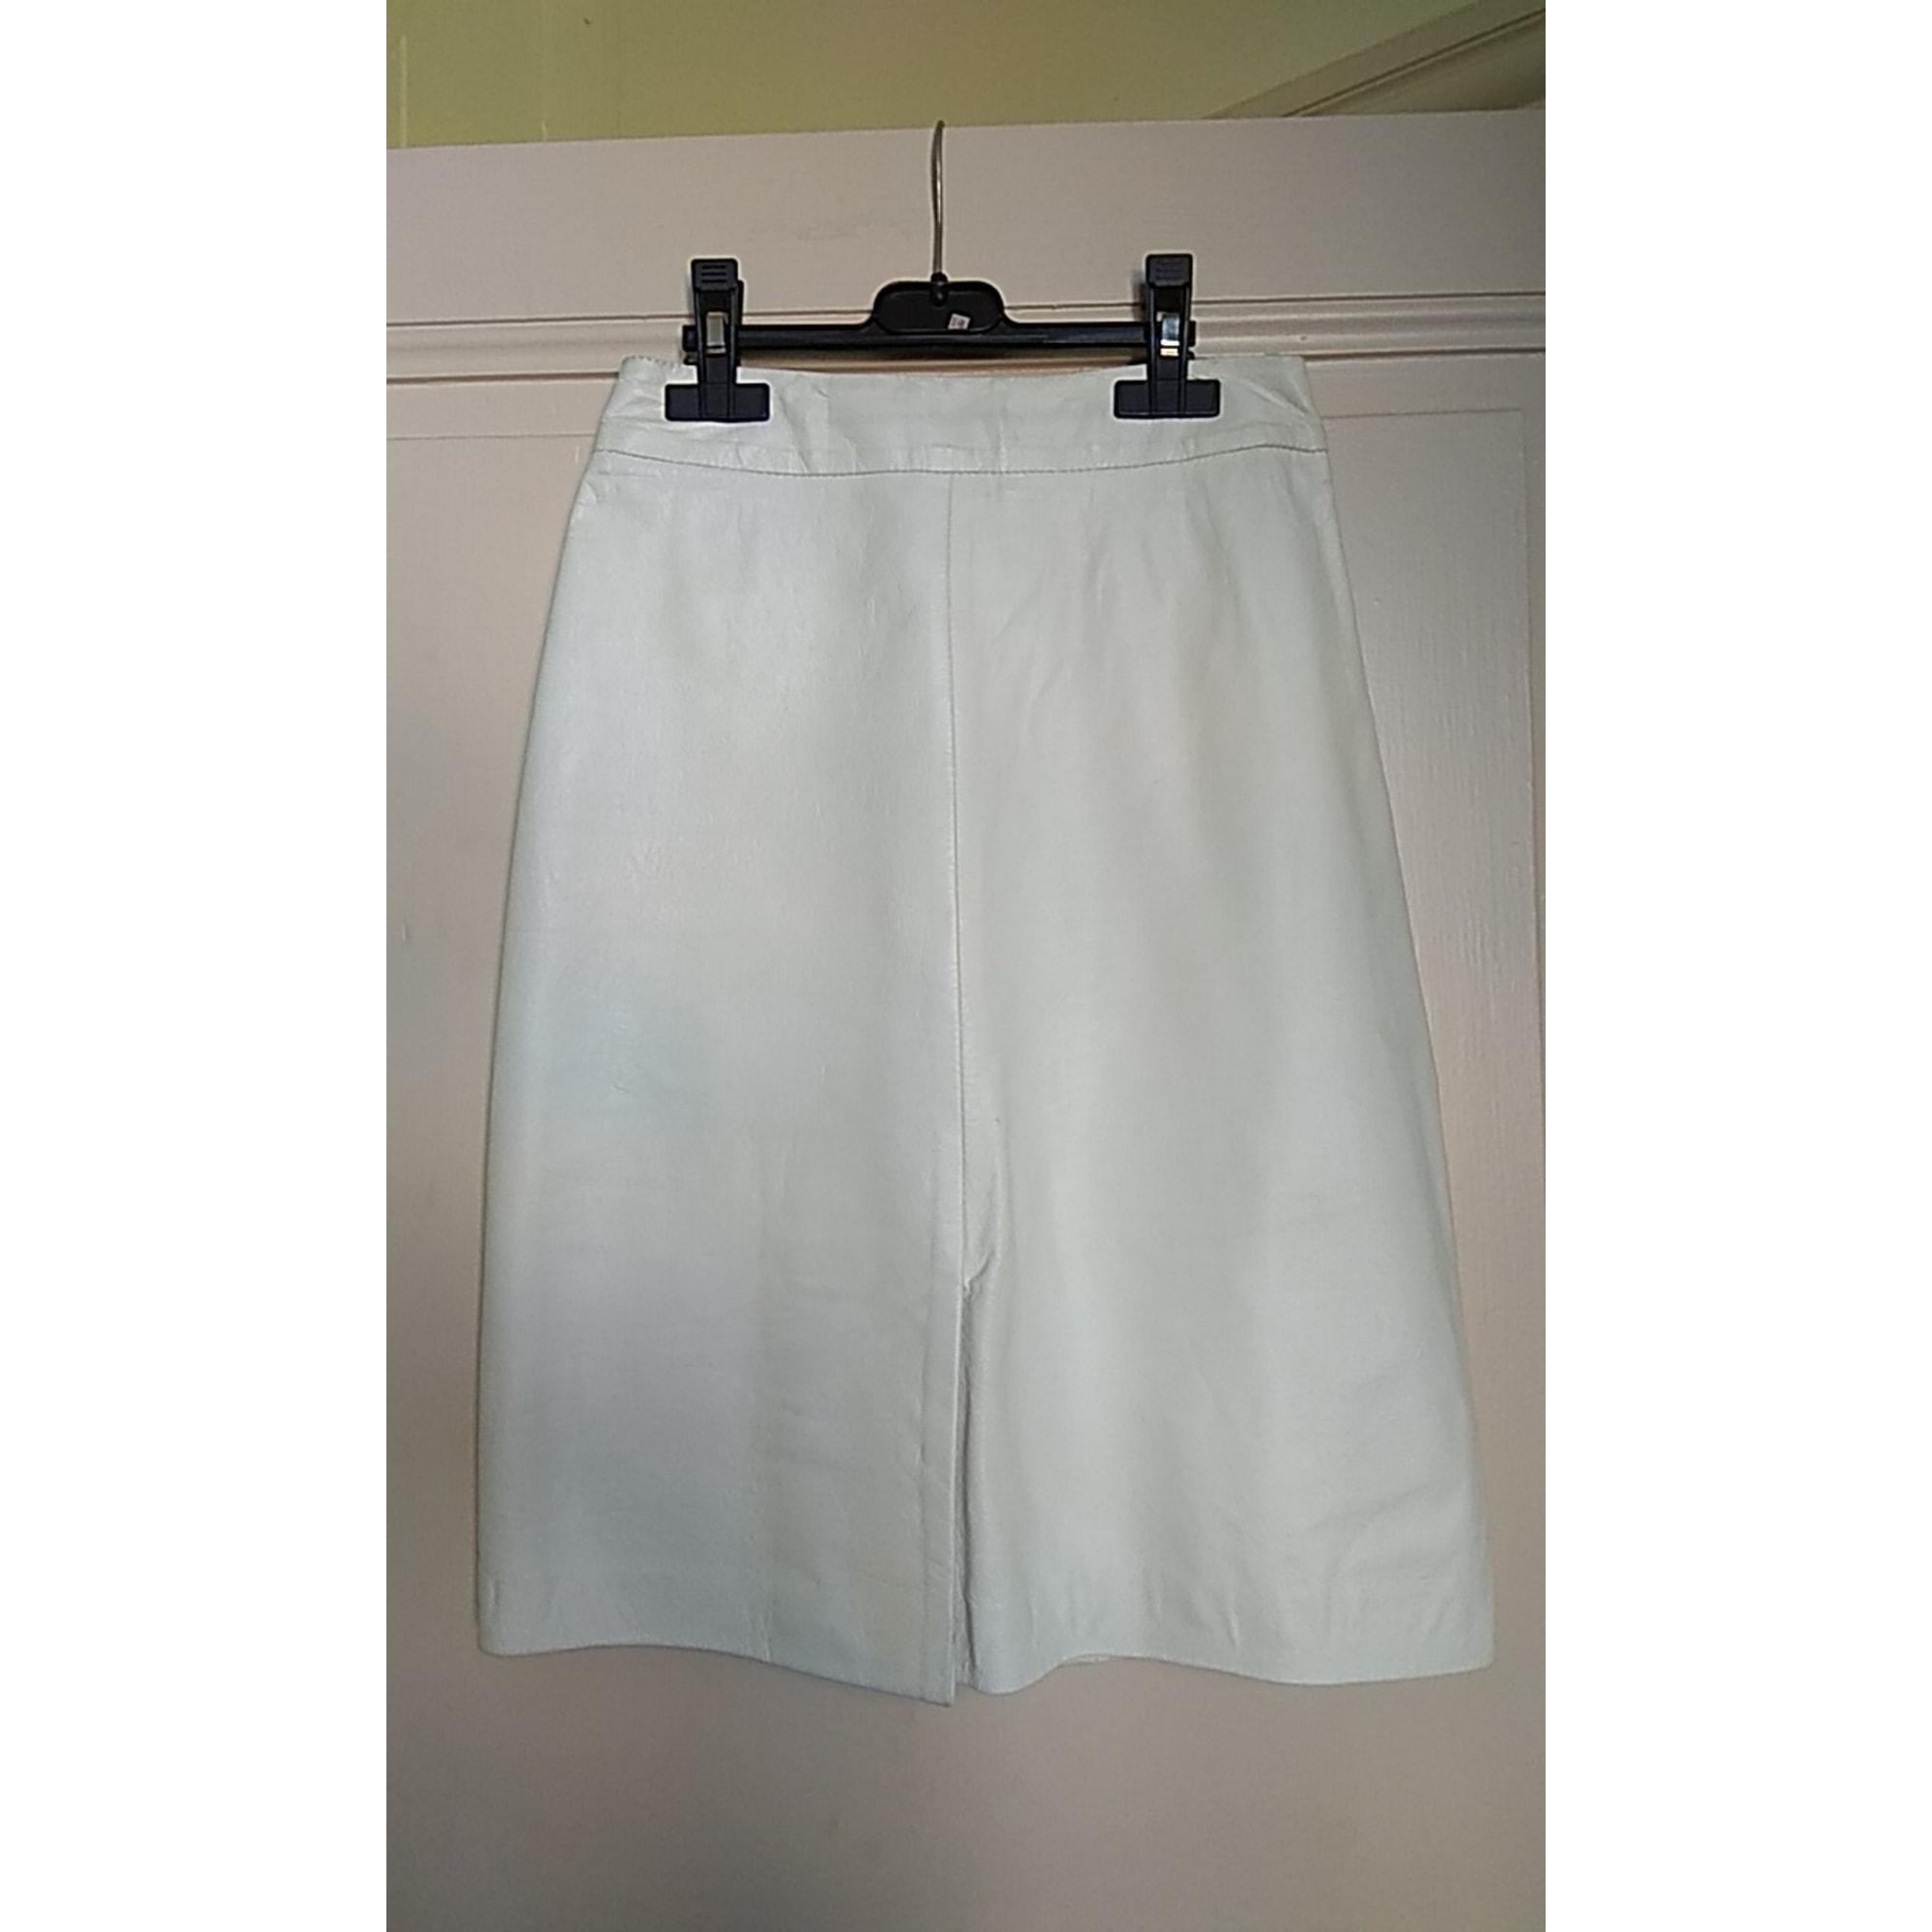 Jupe mi-longue GUY LAROCHE Blanc, blanc cassé, écru